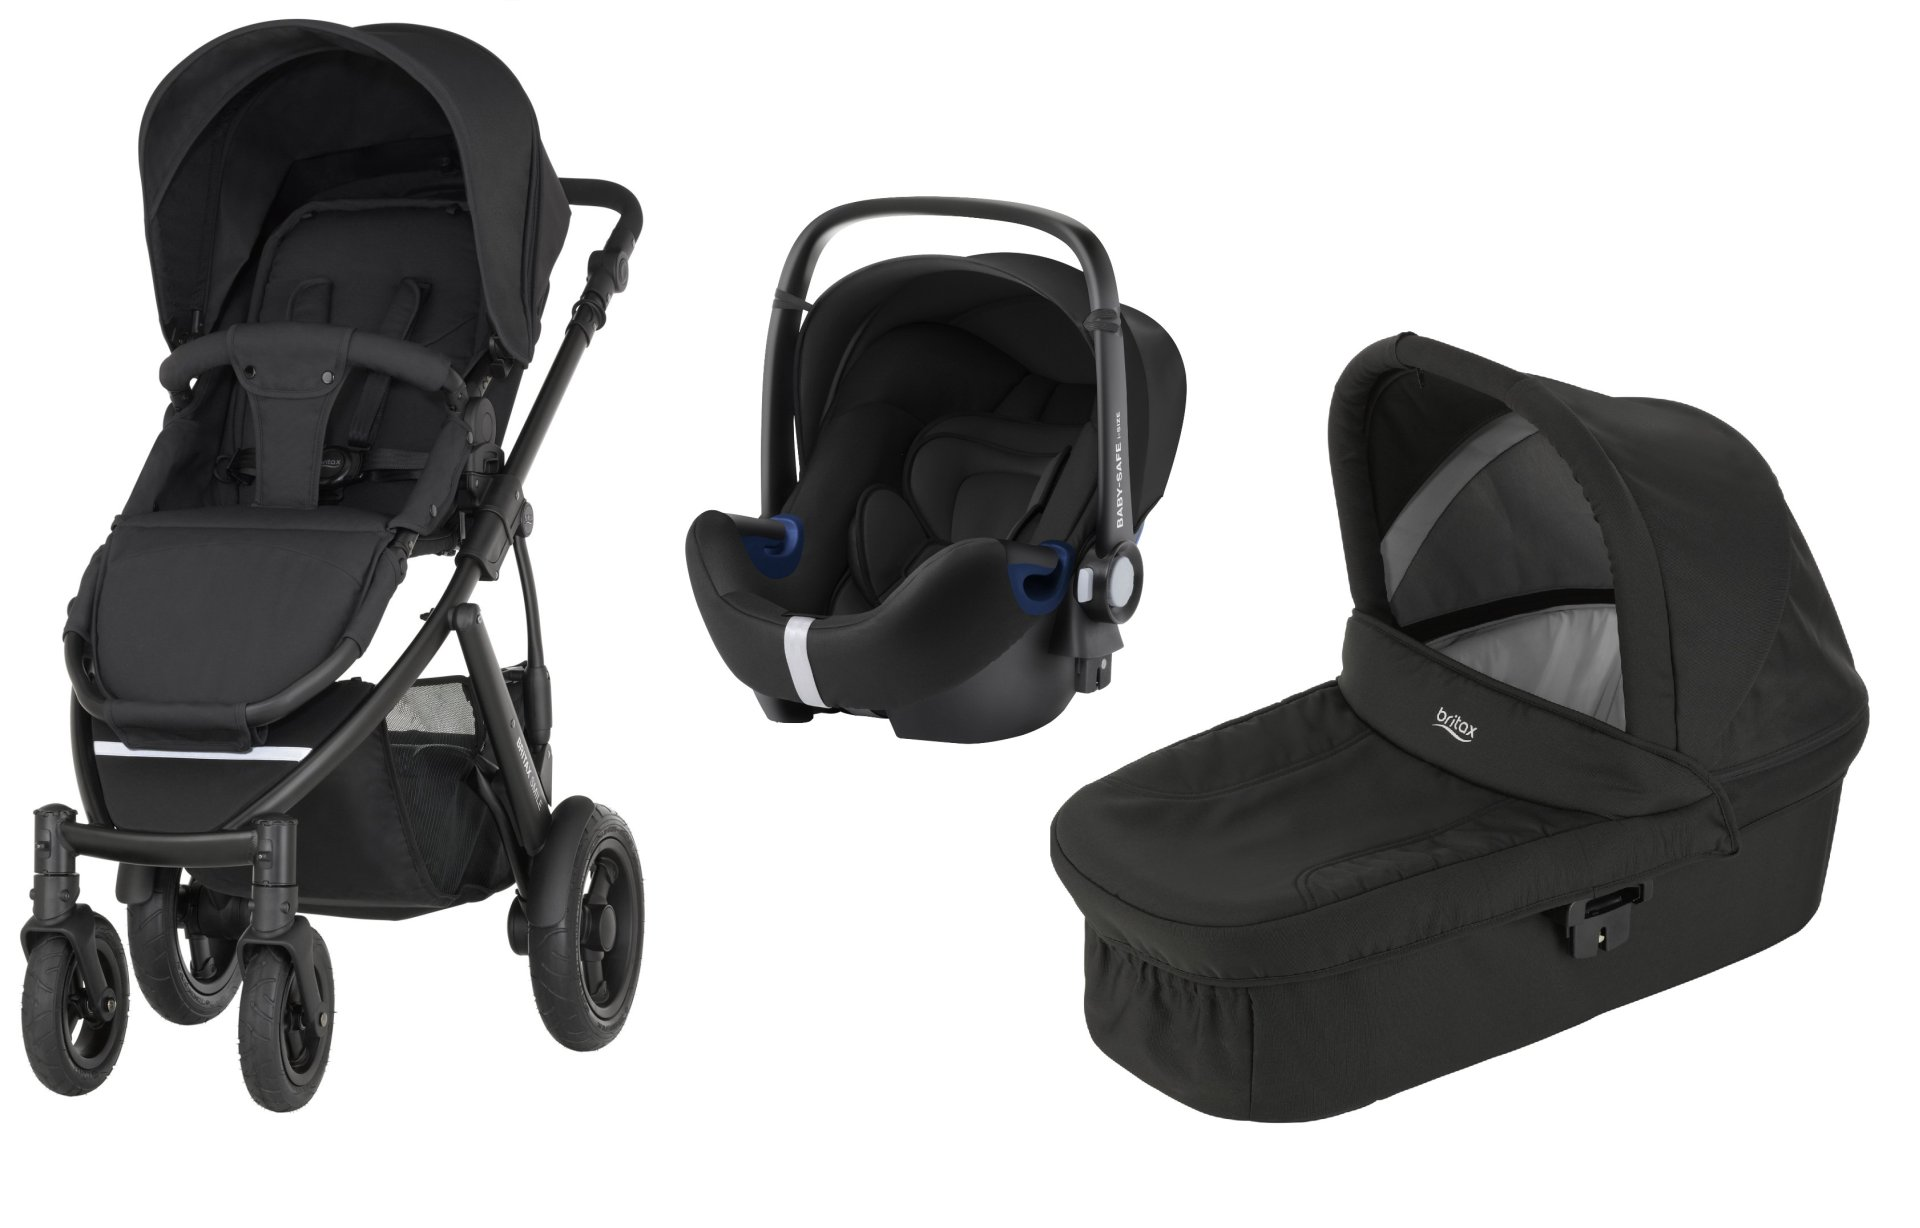 britax r mer smile 2 incl hard carrycot infant car seat baby safe 2 i size 2019 cosmos black. Black Bedroom Furniture Sets. Home Design Ideas